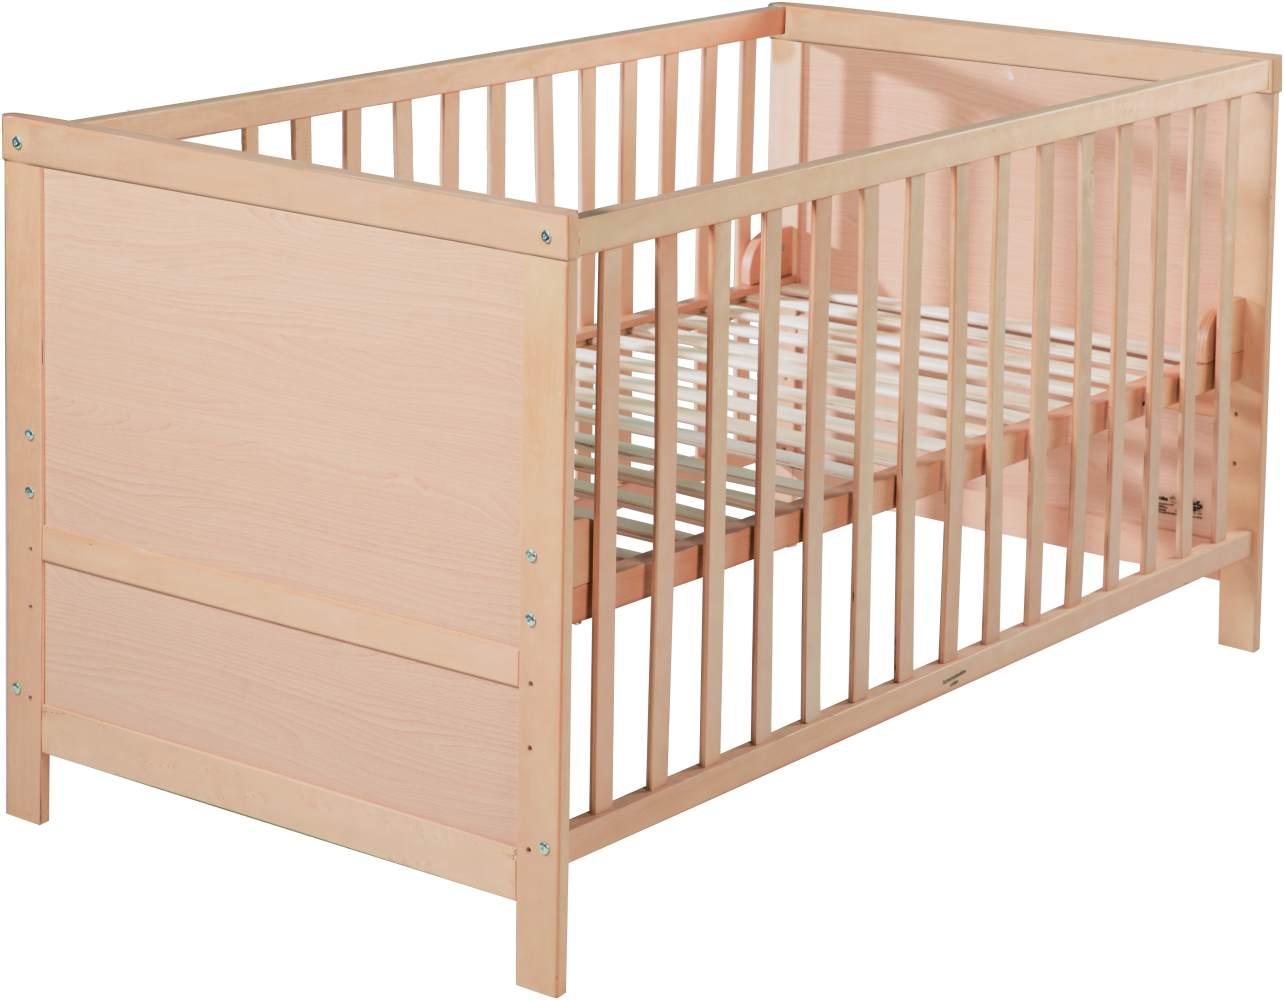 roba 'Lene' Kombi Kinderbett, natur, 70 x 140 cm, Lattenrost 3-fach höhenverstellbar Bild 1